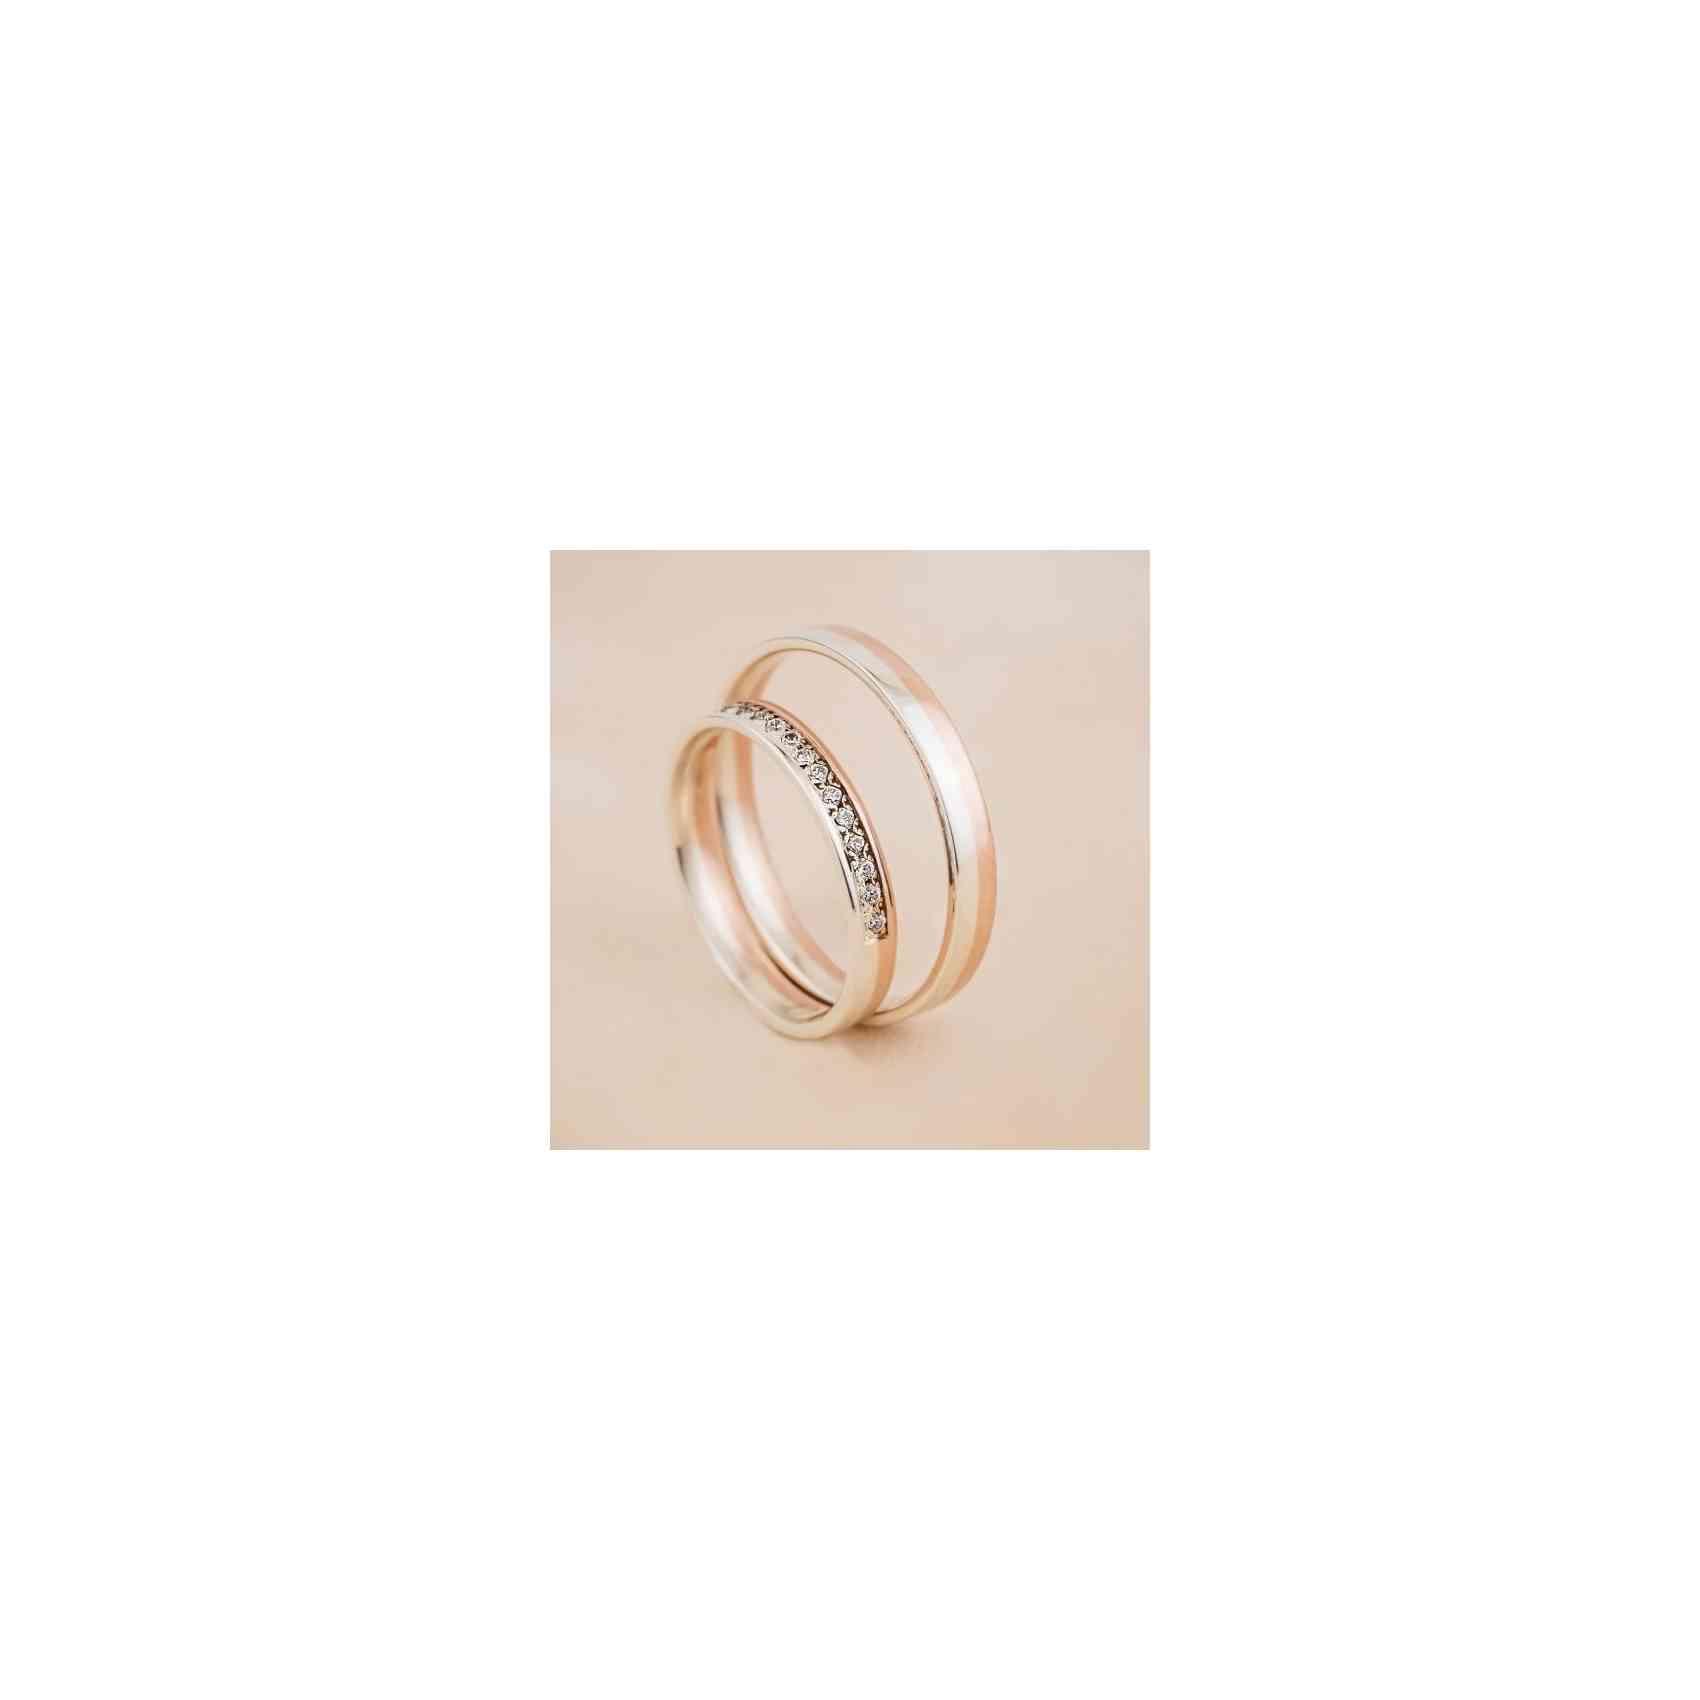 Set Verighete Tamy din Aur Alb și Roz 14K cu Diamante